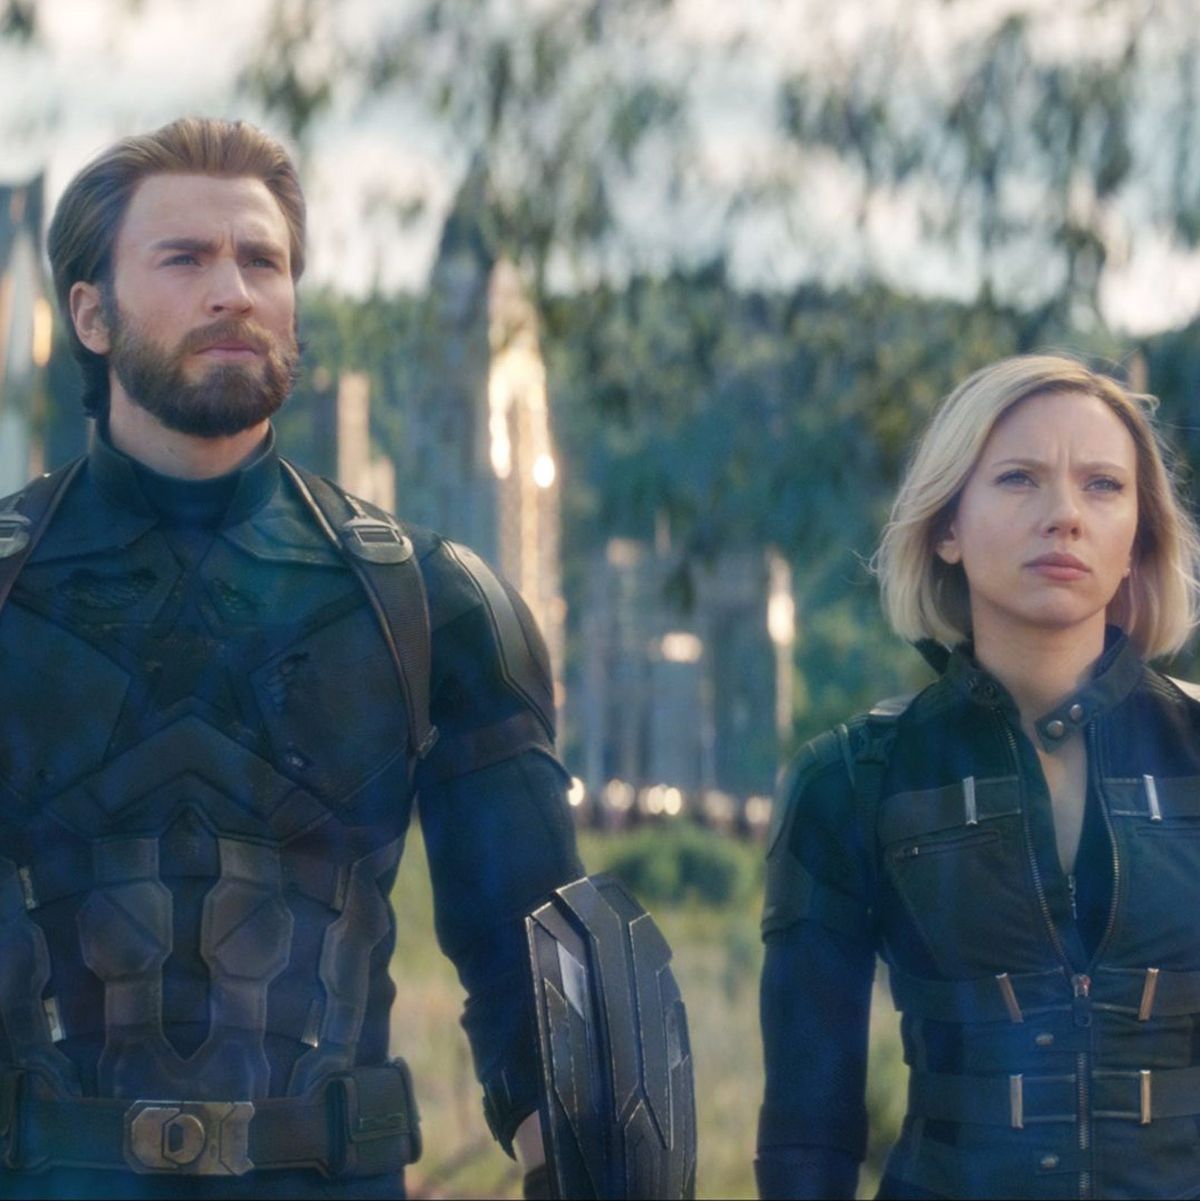 Scarlett Johansson And Chris Evans Talk Marvel Controversy